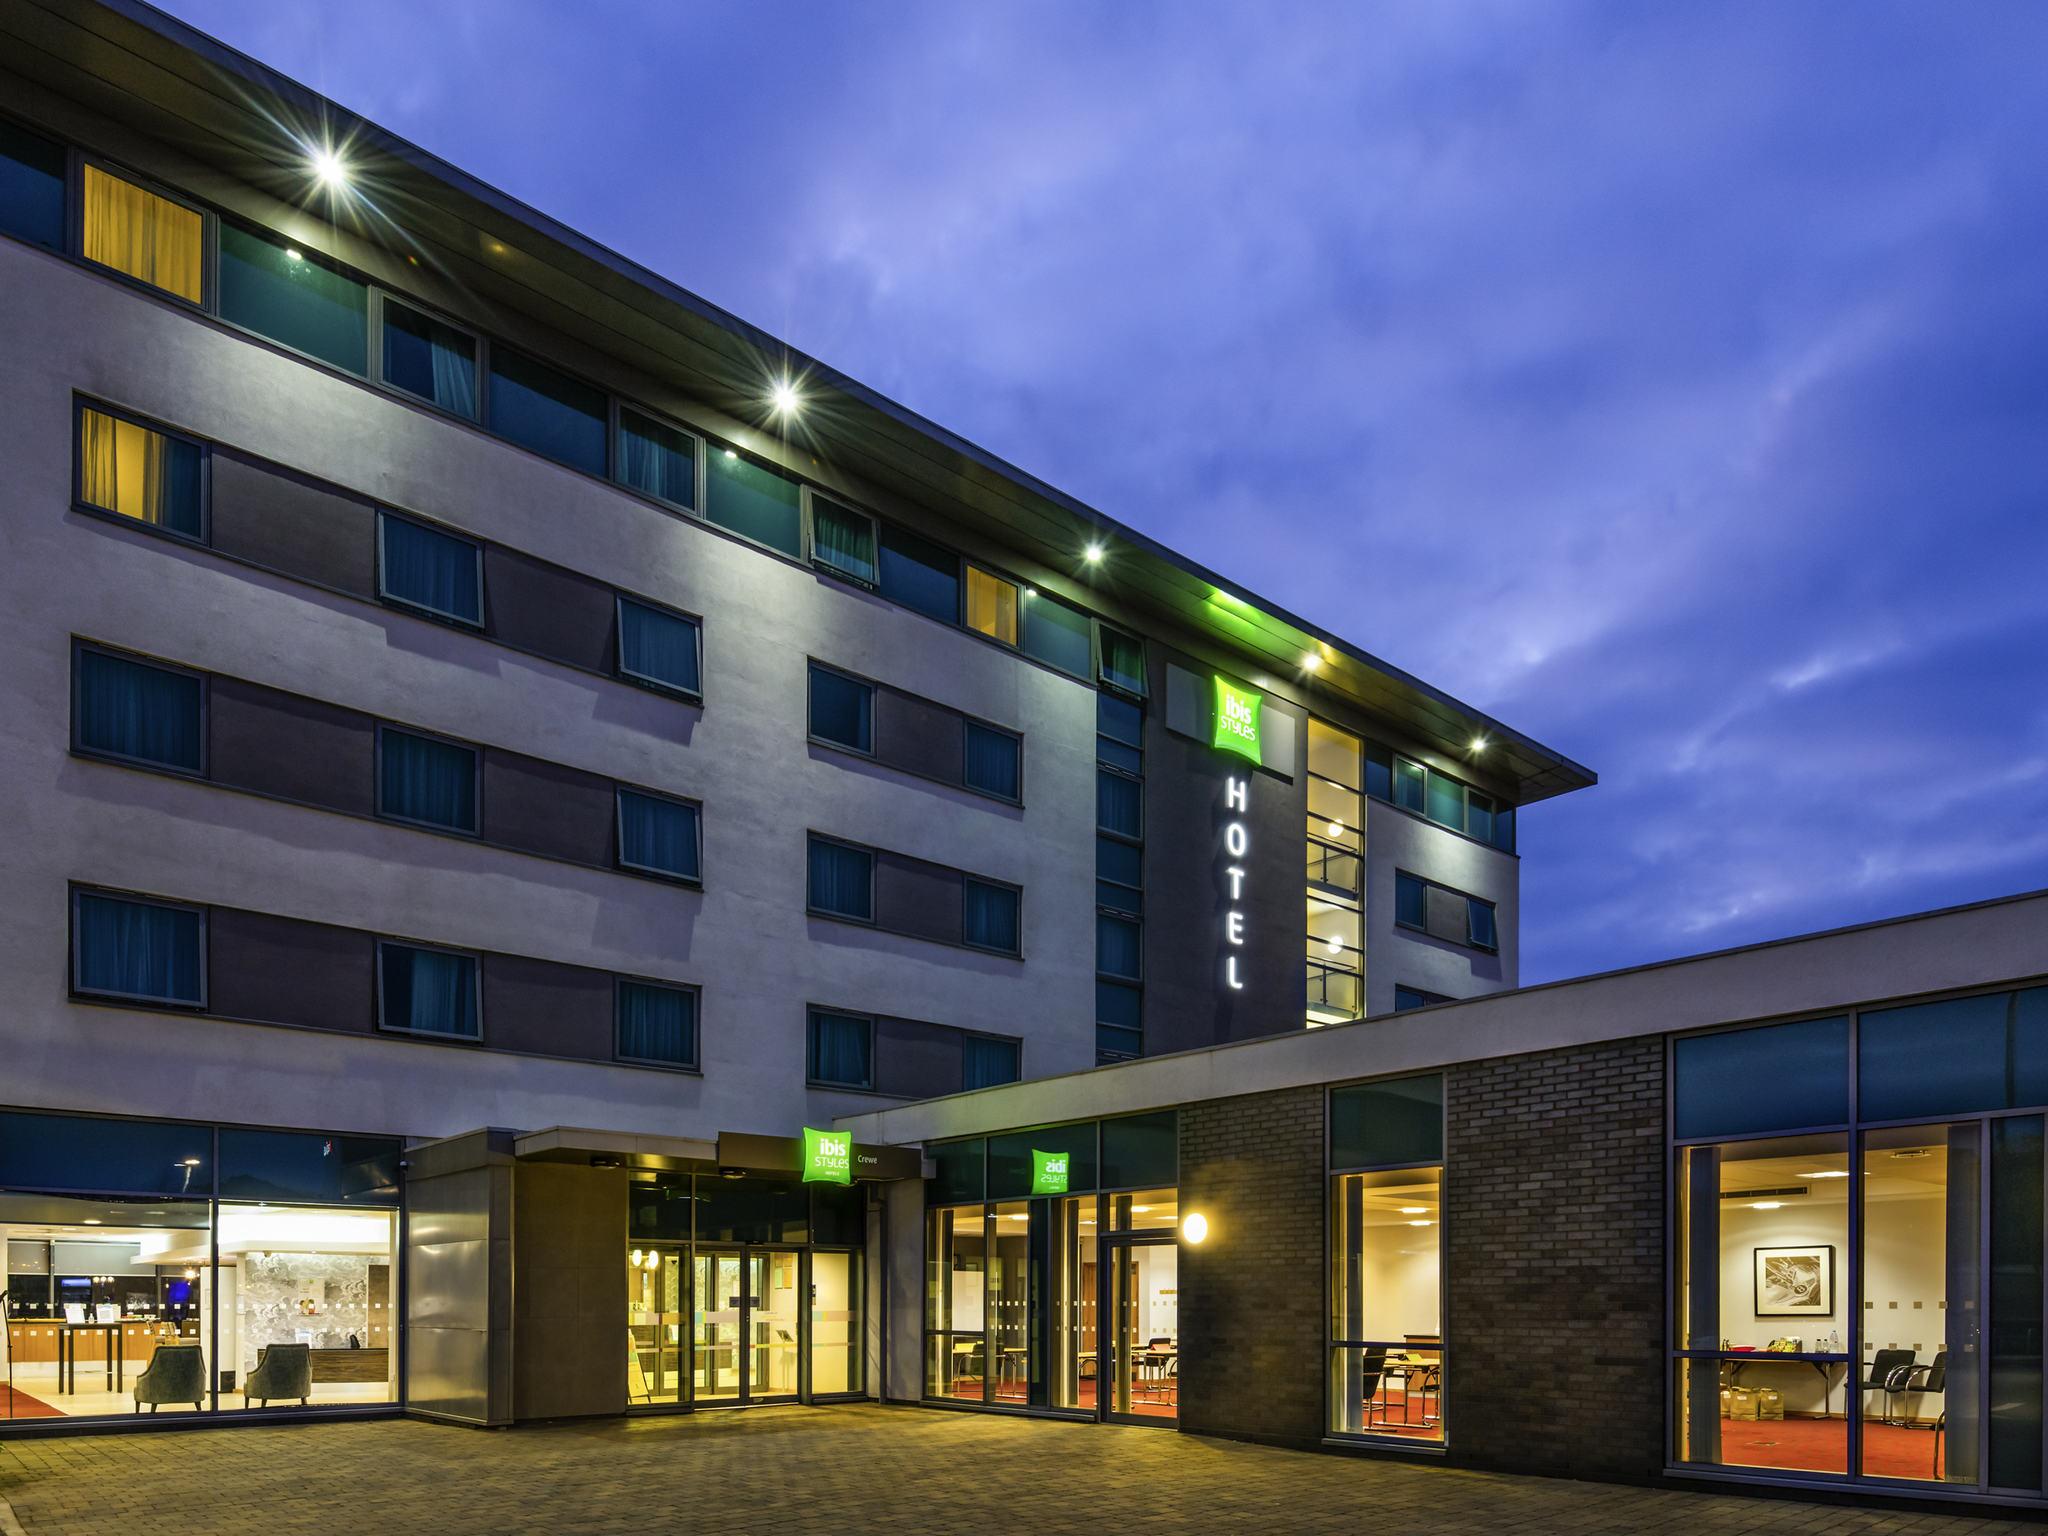 collection bentley florida s boutique college osprey hotel bw hotels sarasota near premier